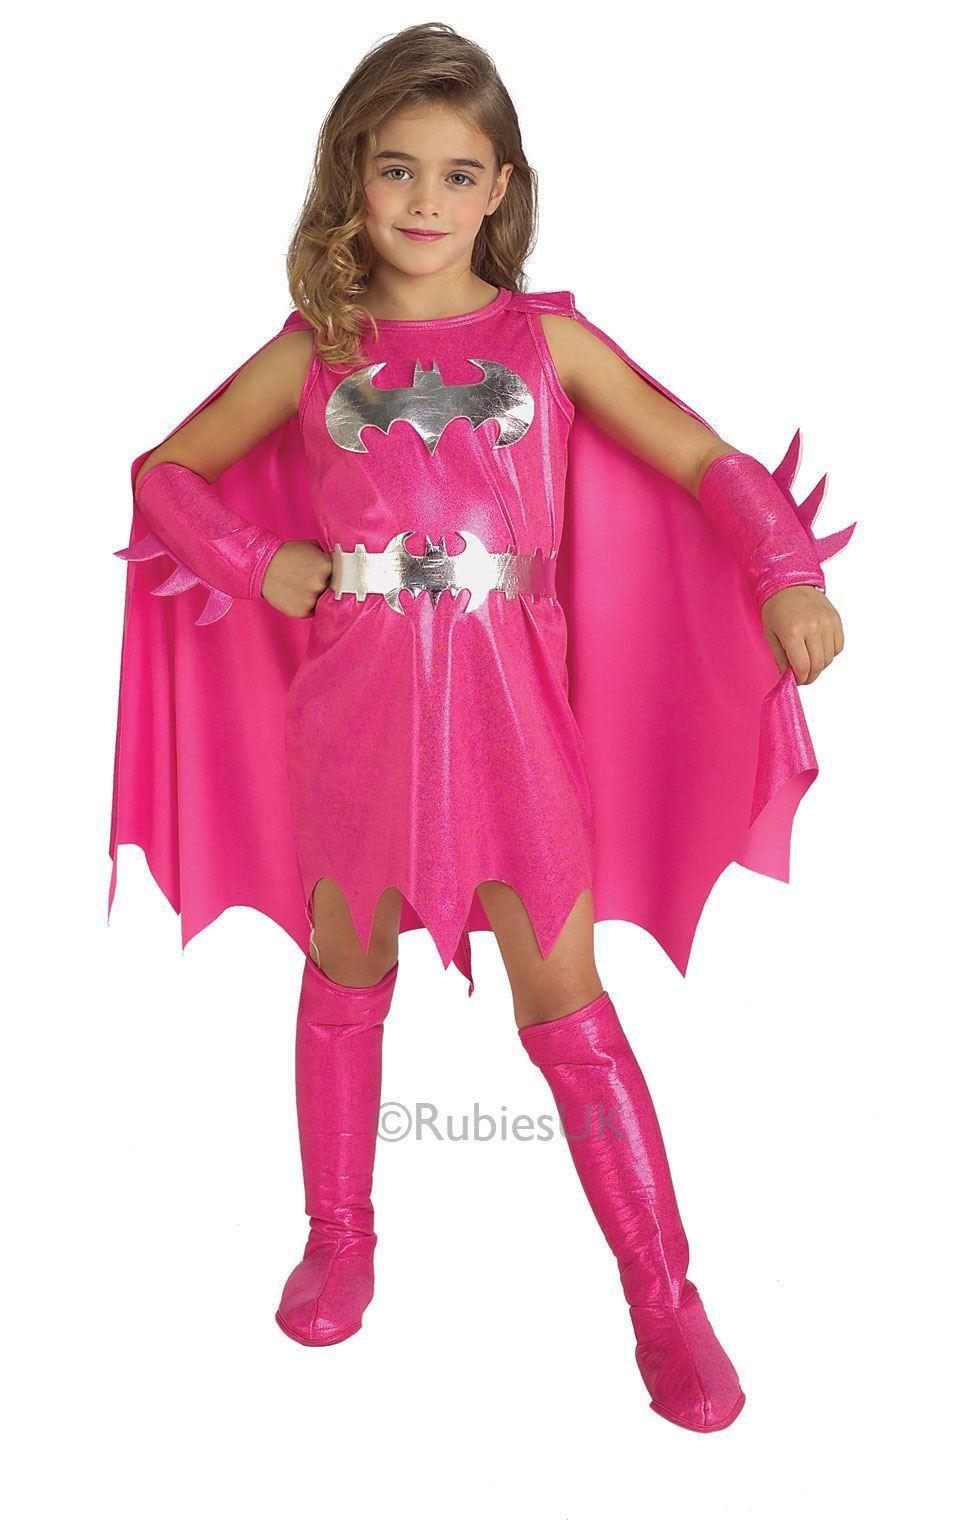 Girls-Deluxe-Child-Superhero-Kids-Storybook-Comic-Movie-Fancy-Dress-Costume